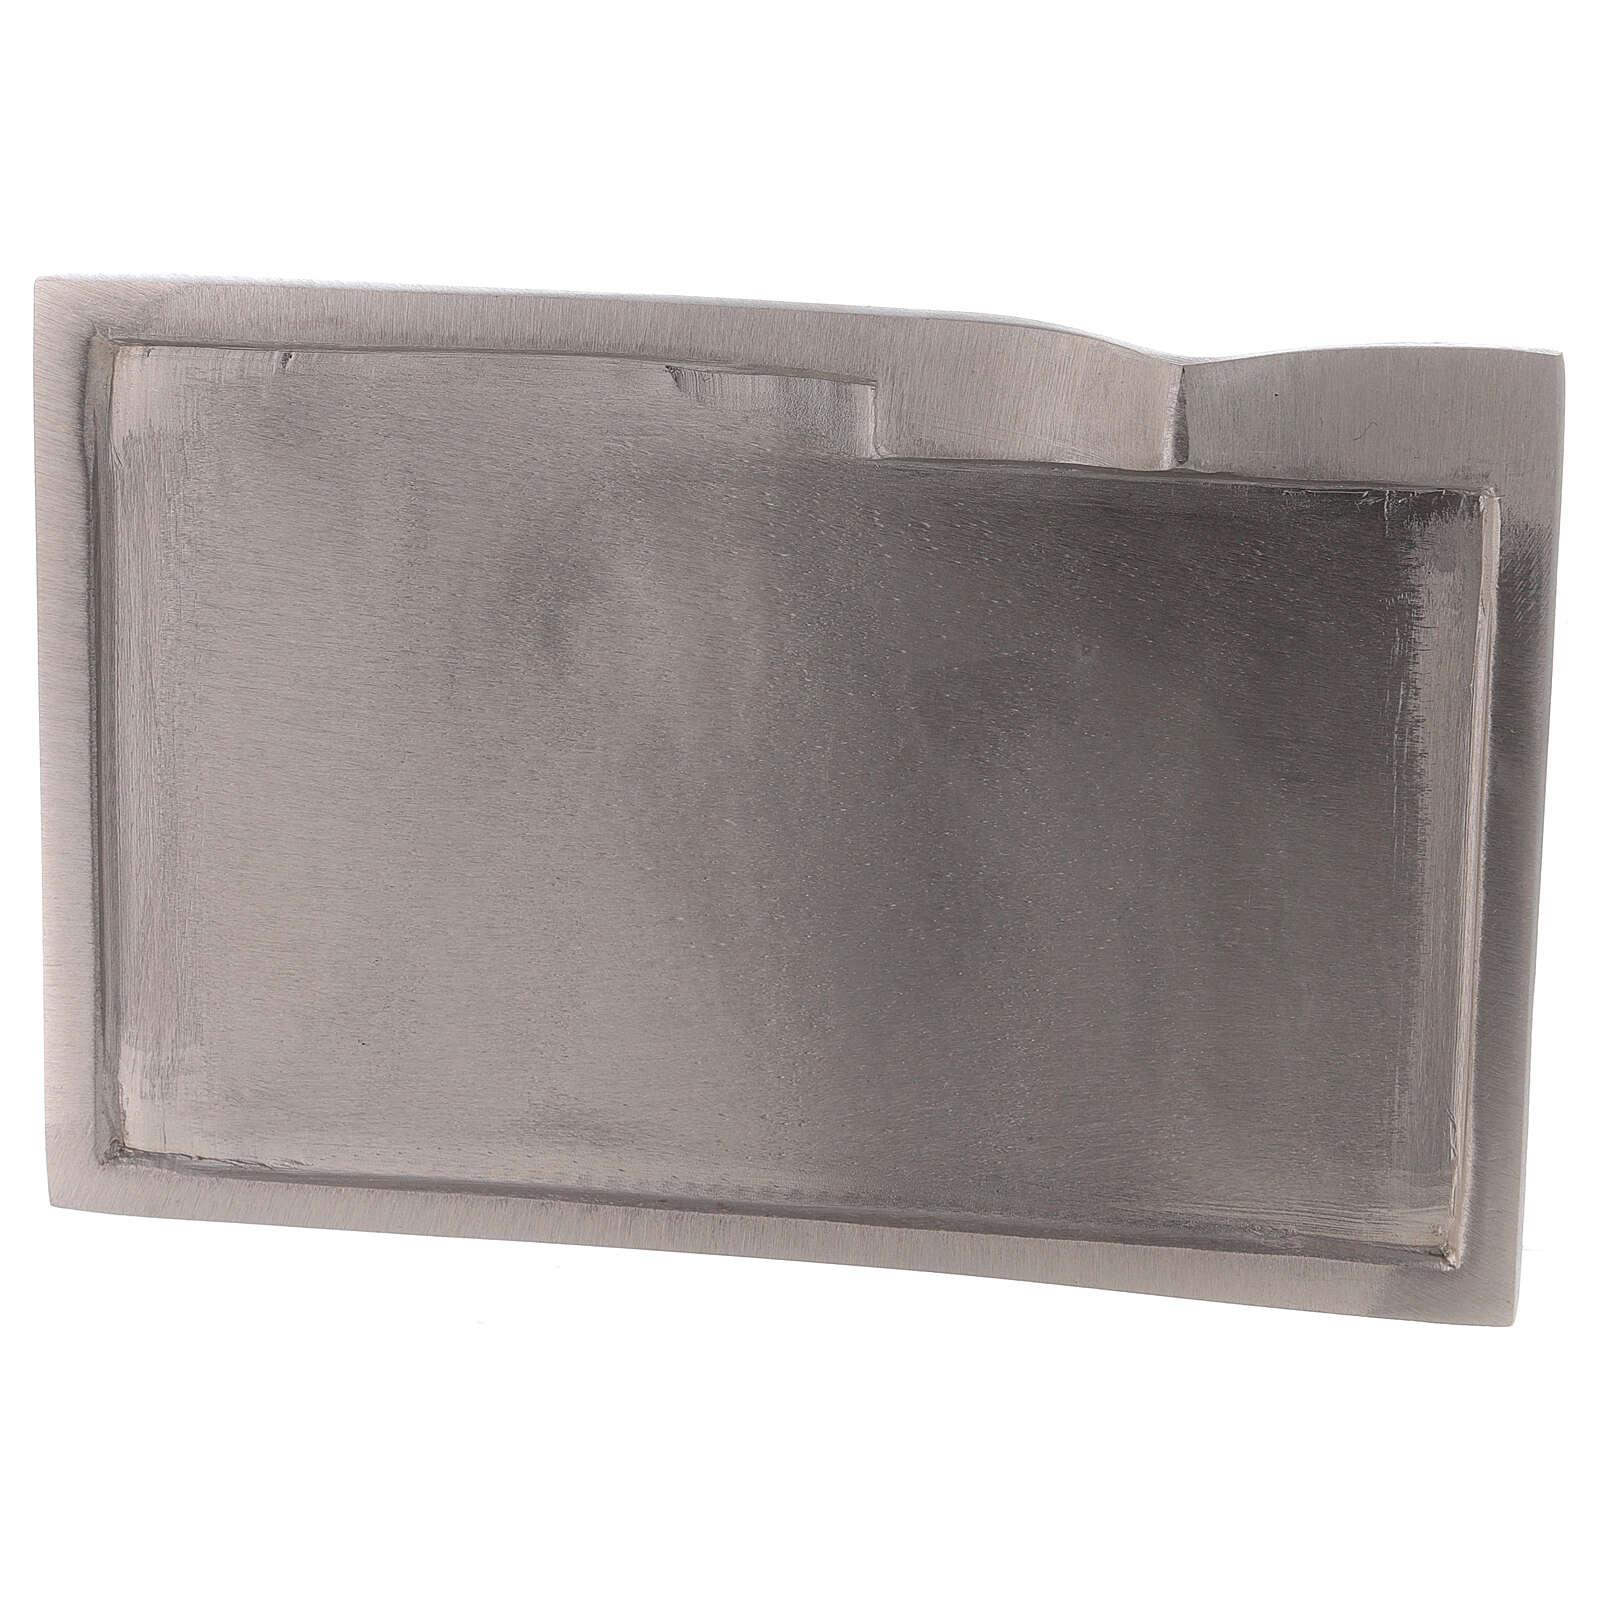 Plato para vela rectangular detalle elevado 16x9 cm 3